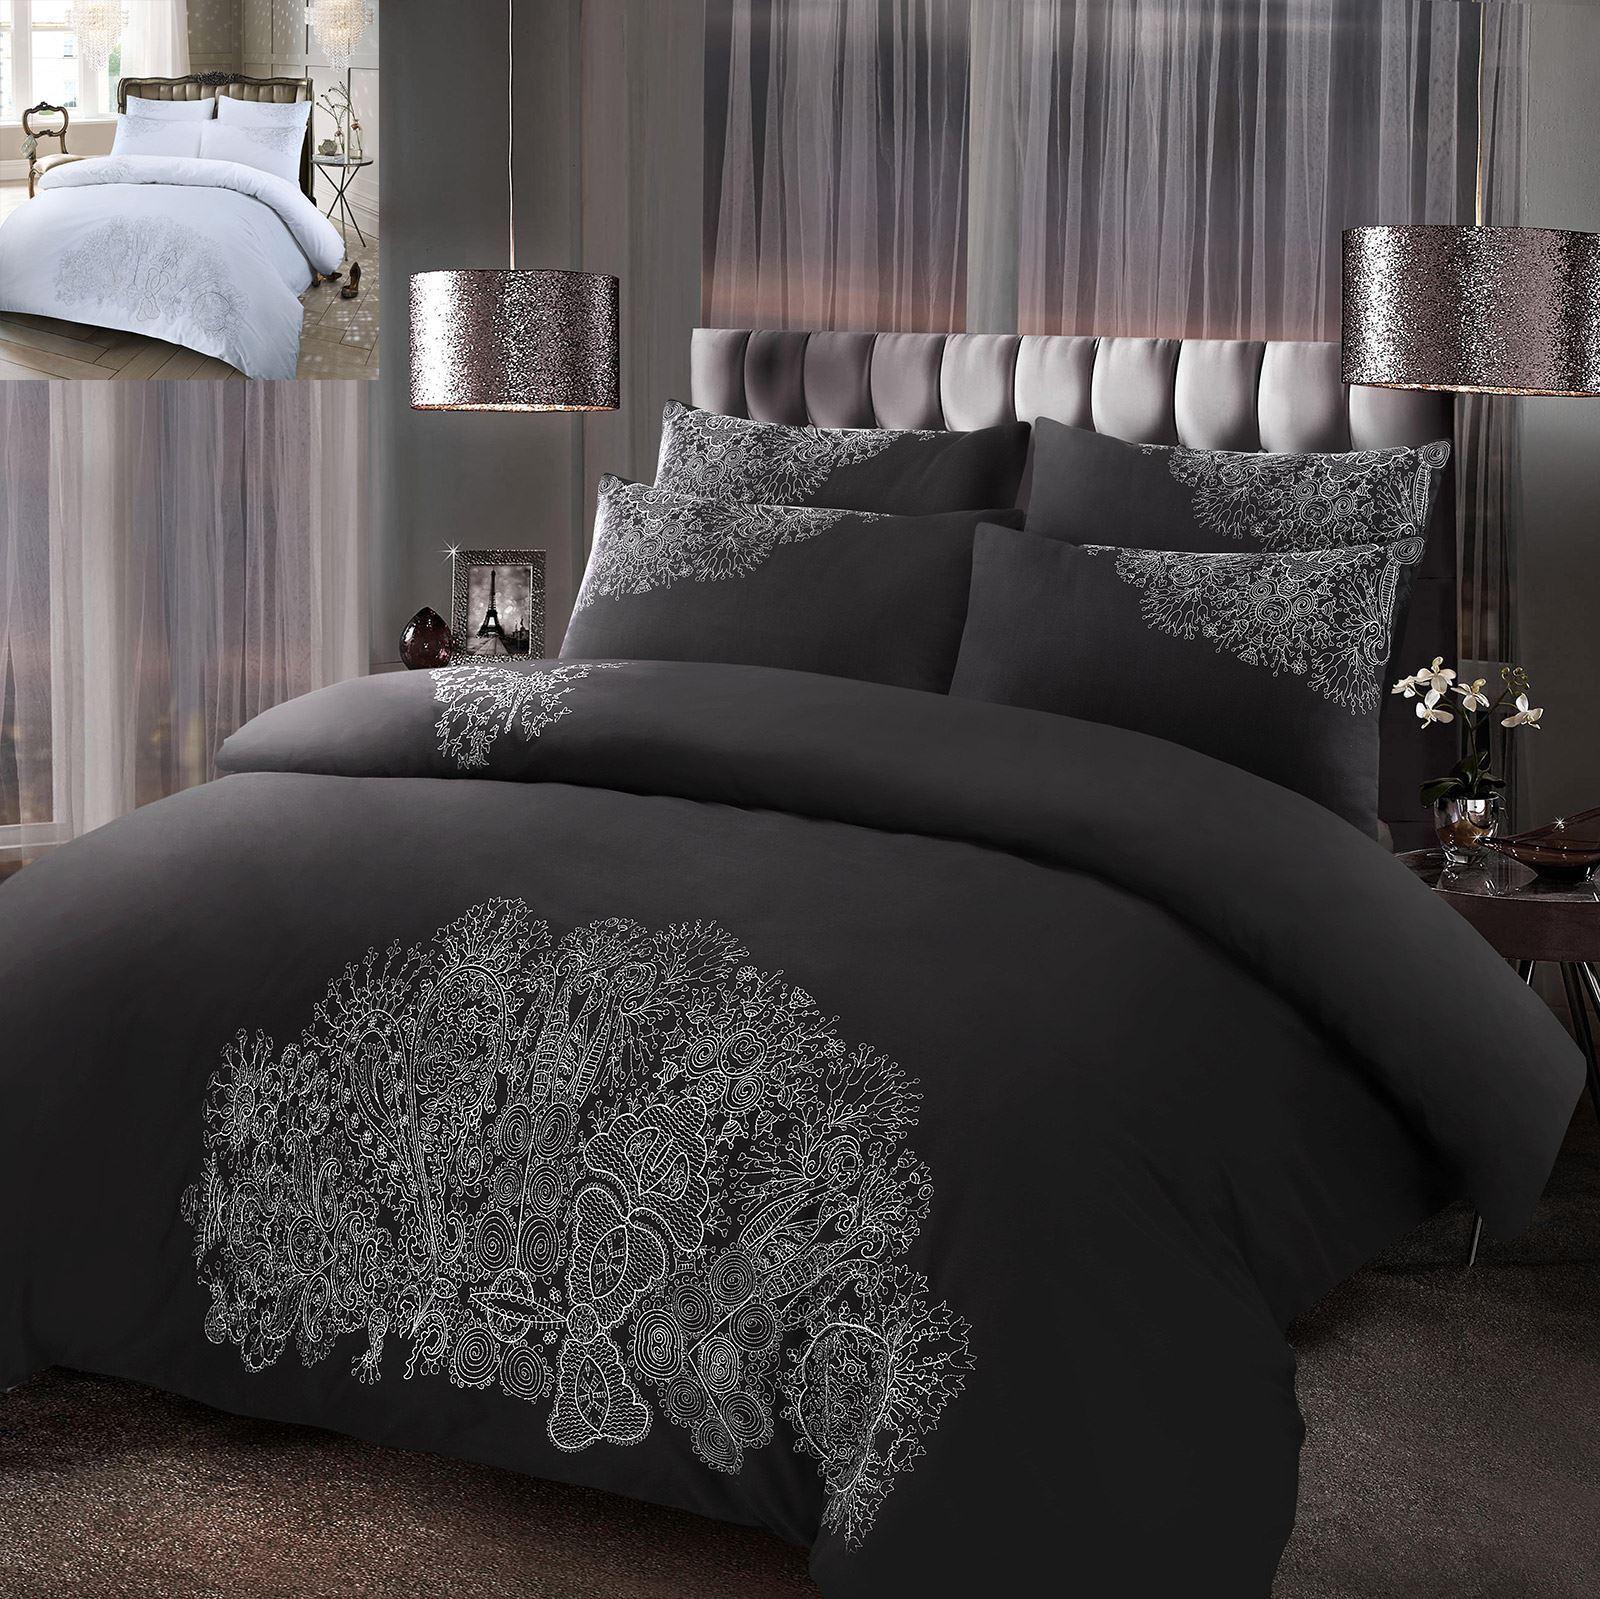 Elegant Luxury Embroidery 100% Cotton 180 Thread Percale Duvet Cover Bedding Set